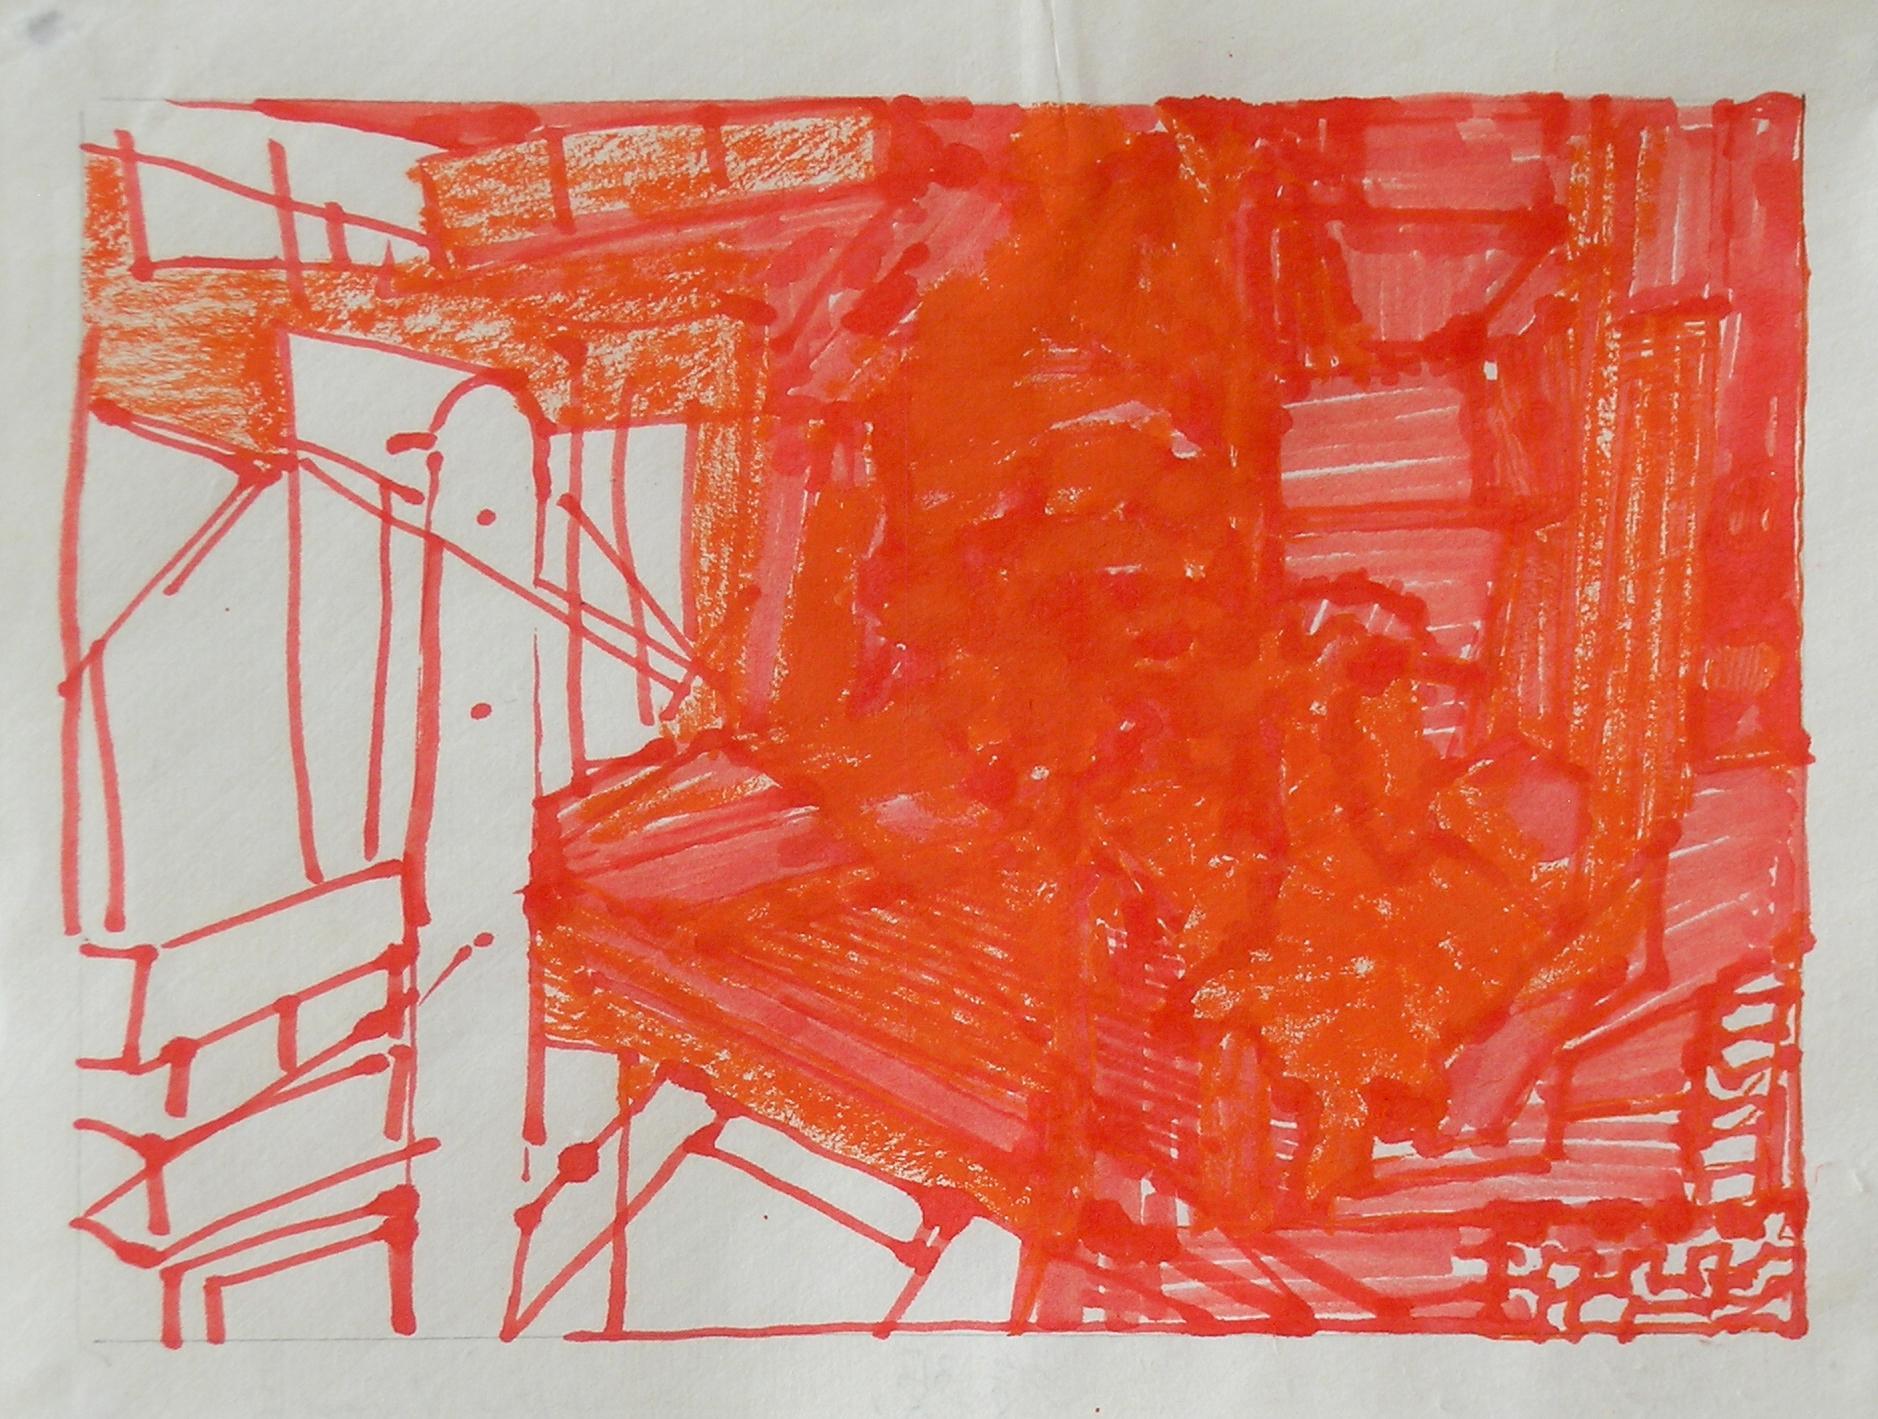 Josette Urso, Backyard 1, 2005, Ink Brush Drawing, 6 x 8 in